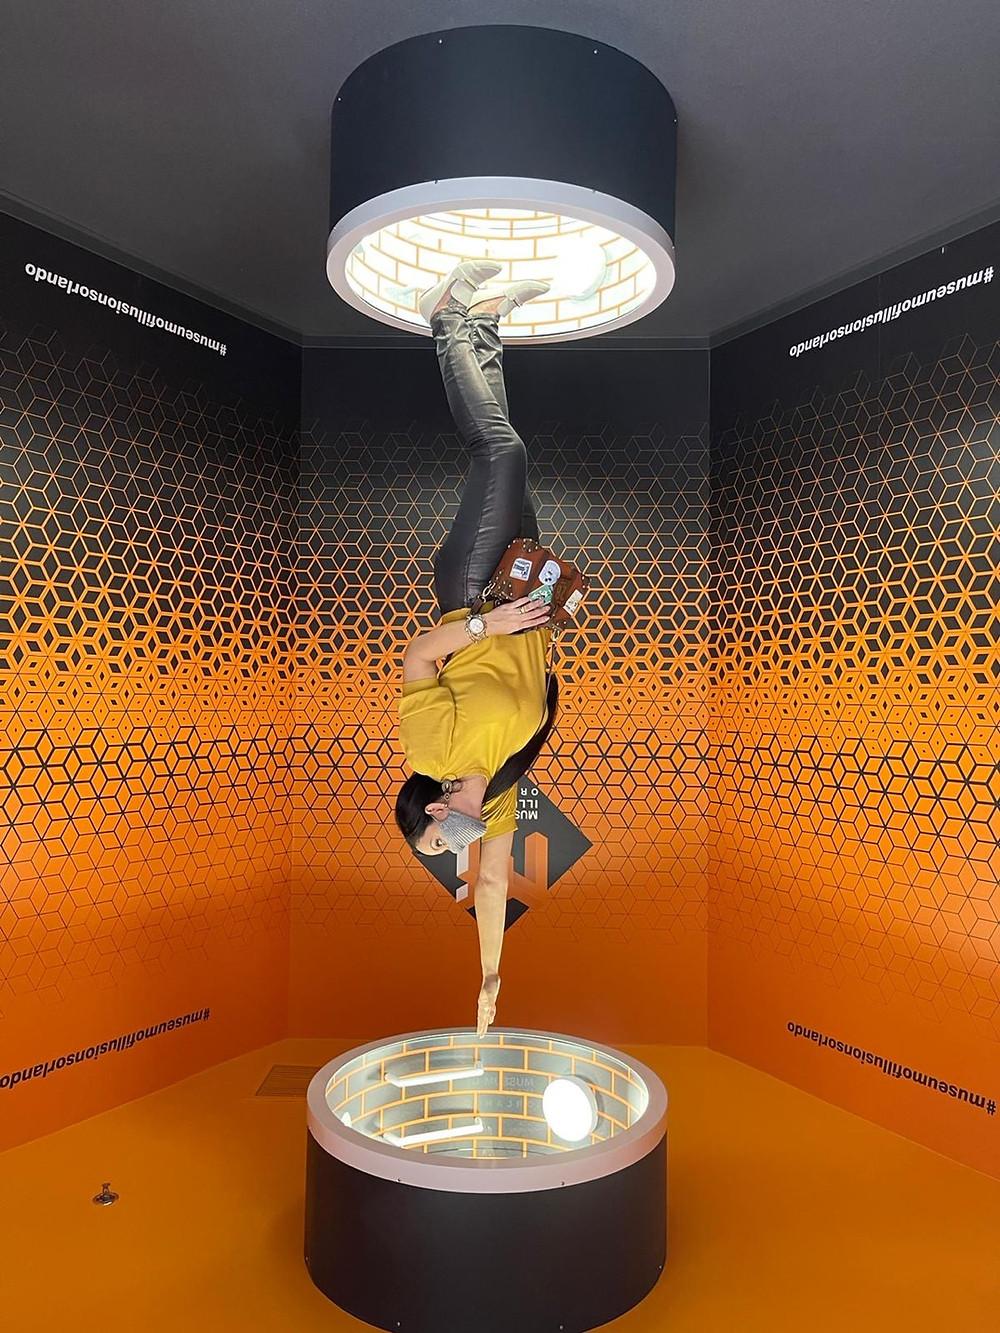 Museum of Illusions ICON Park